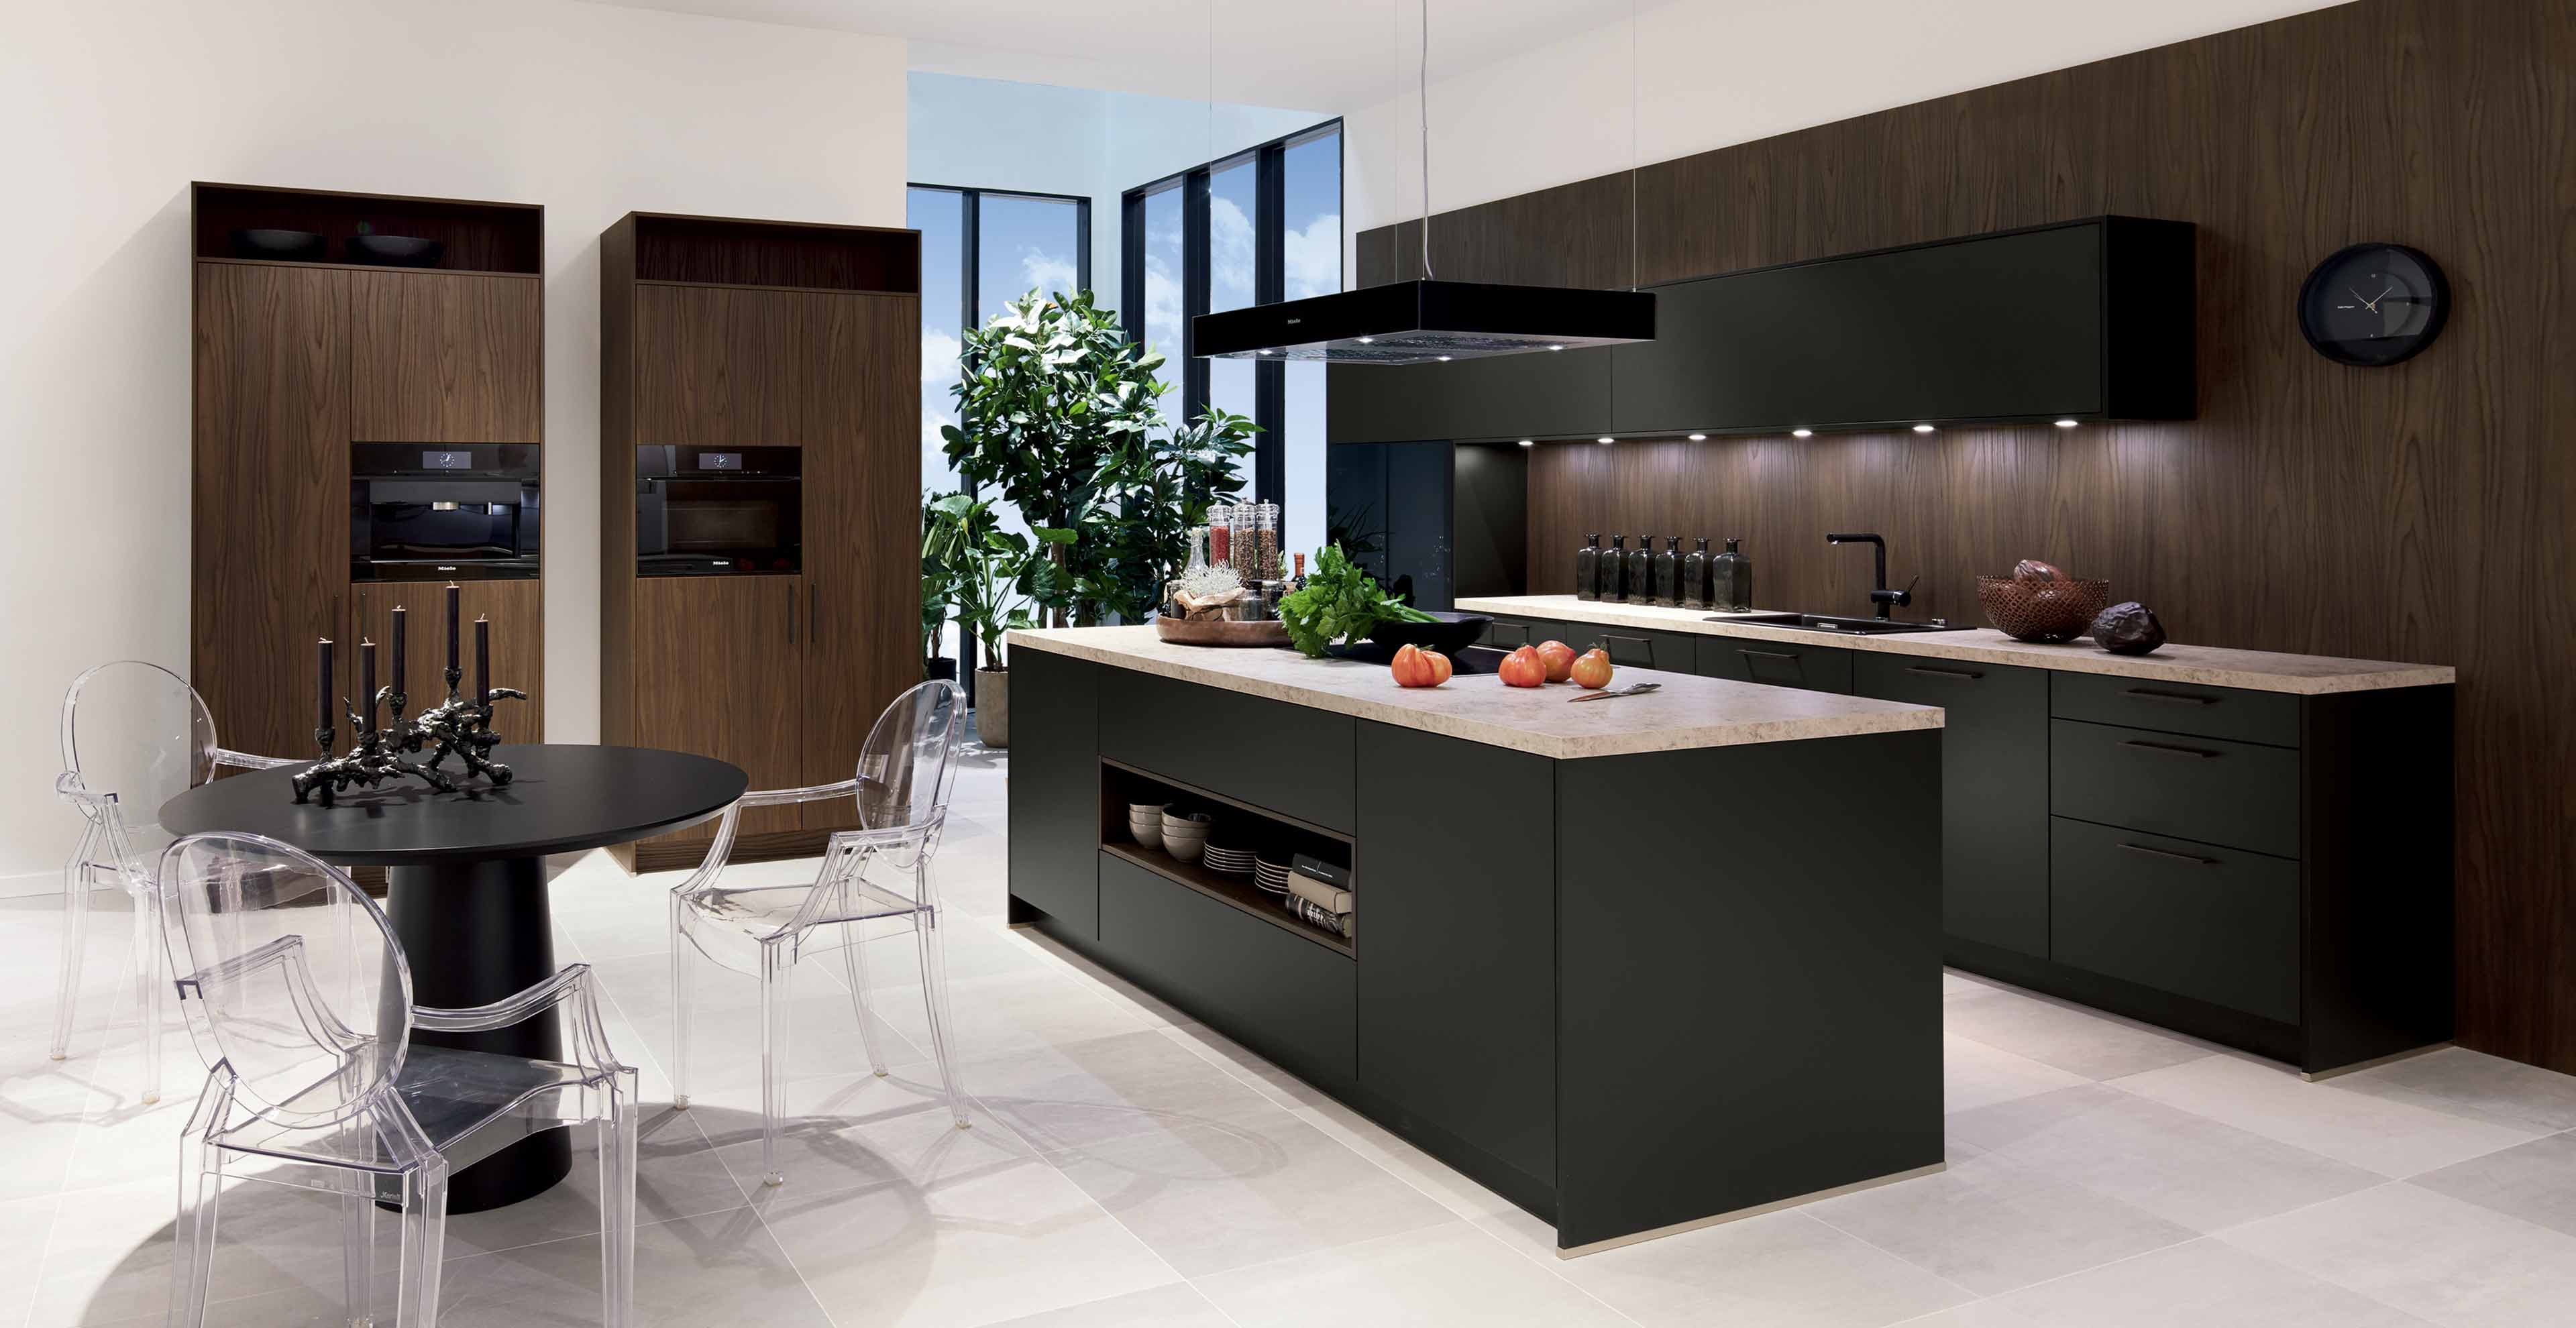 Moderne Küche Havannaschwarz & Sherwood dunkelbraun ...